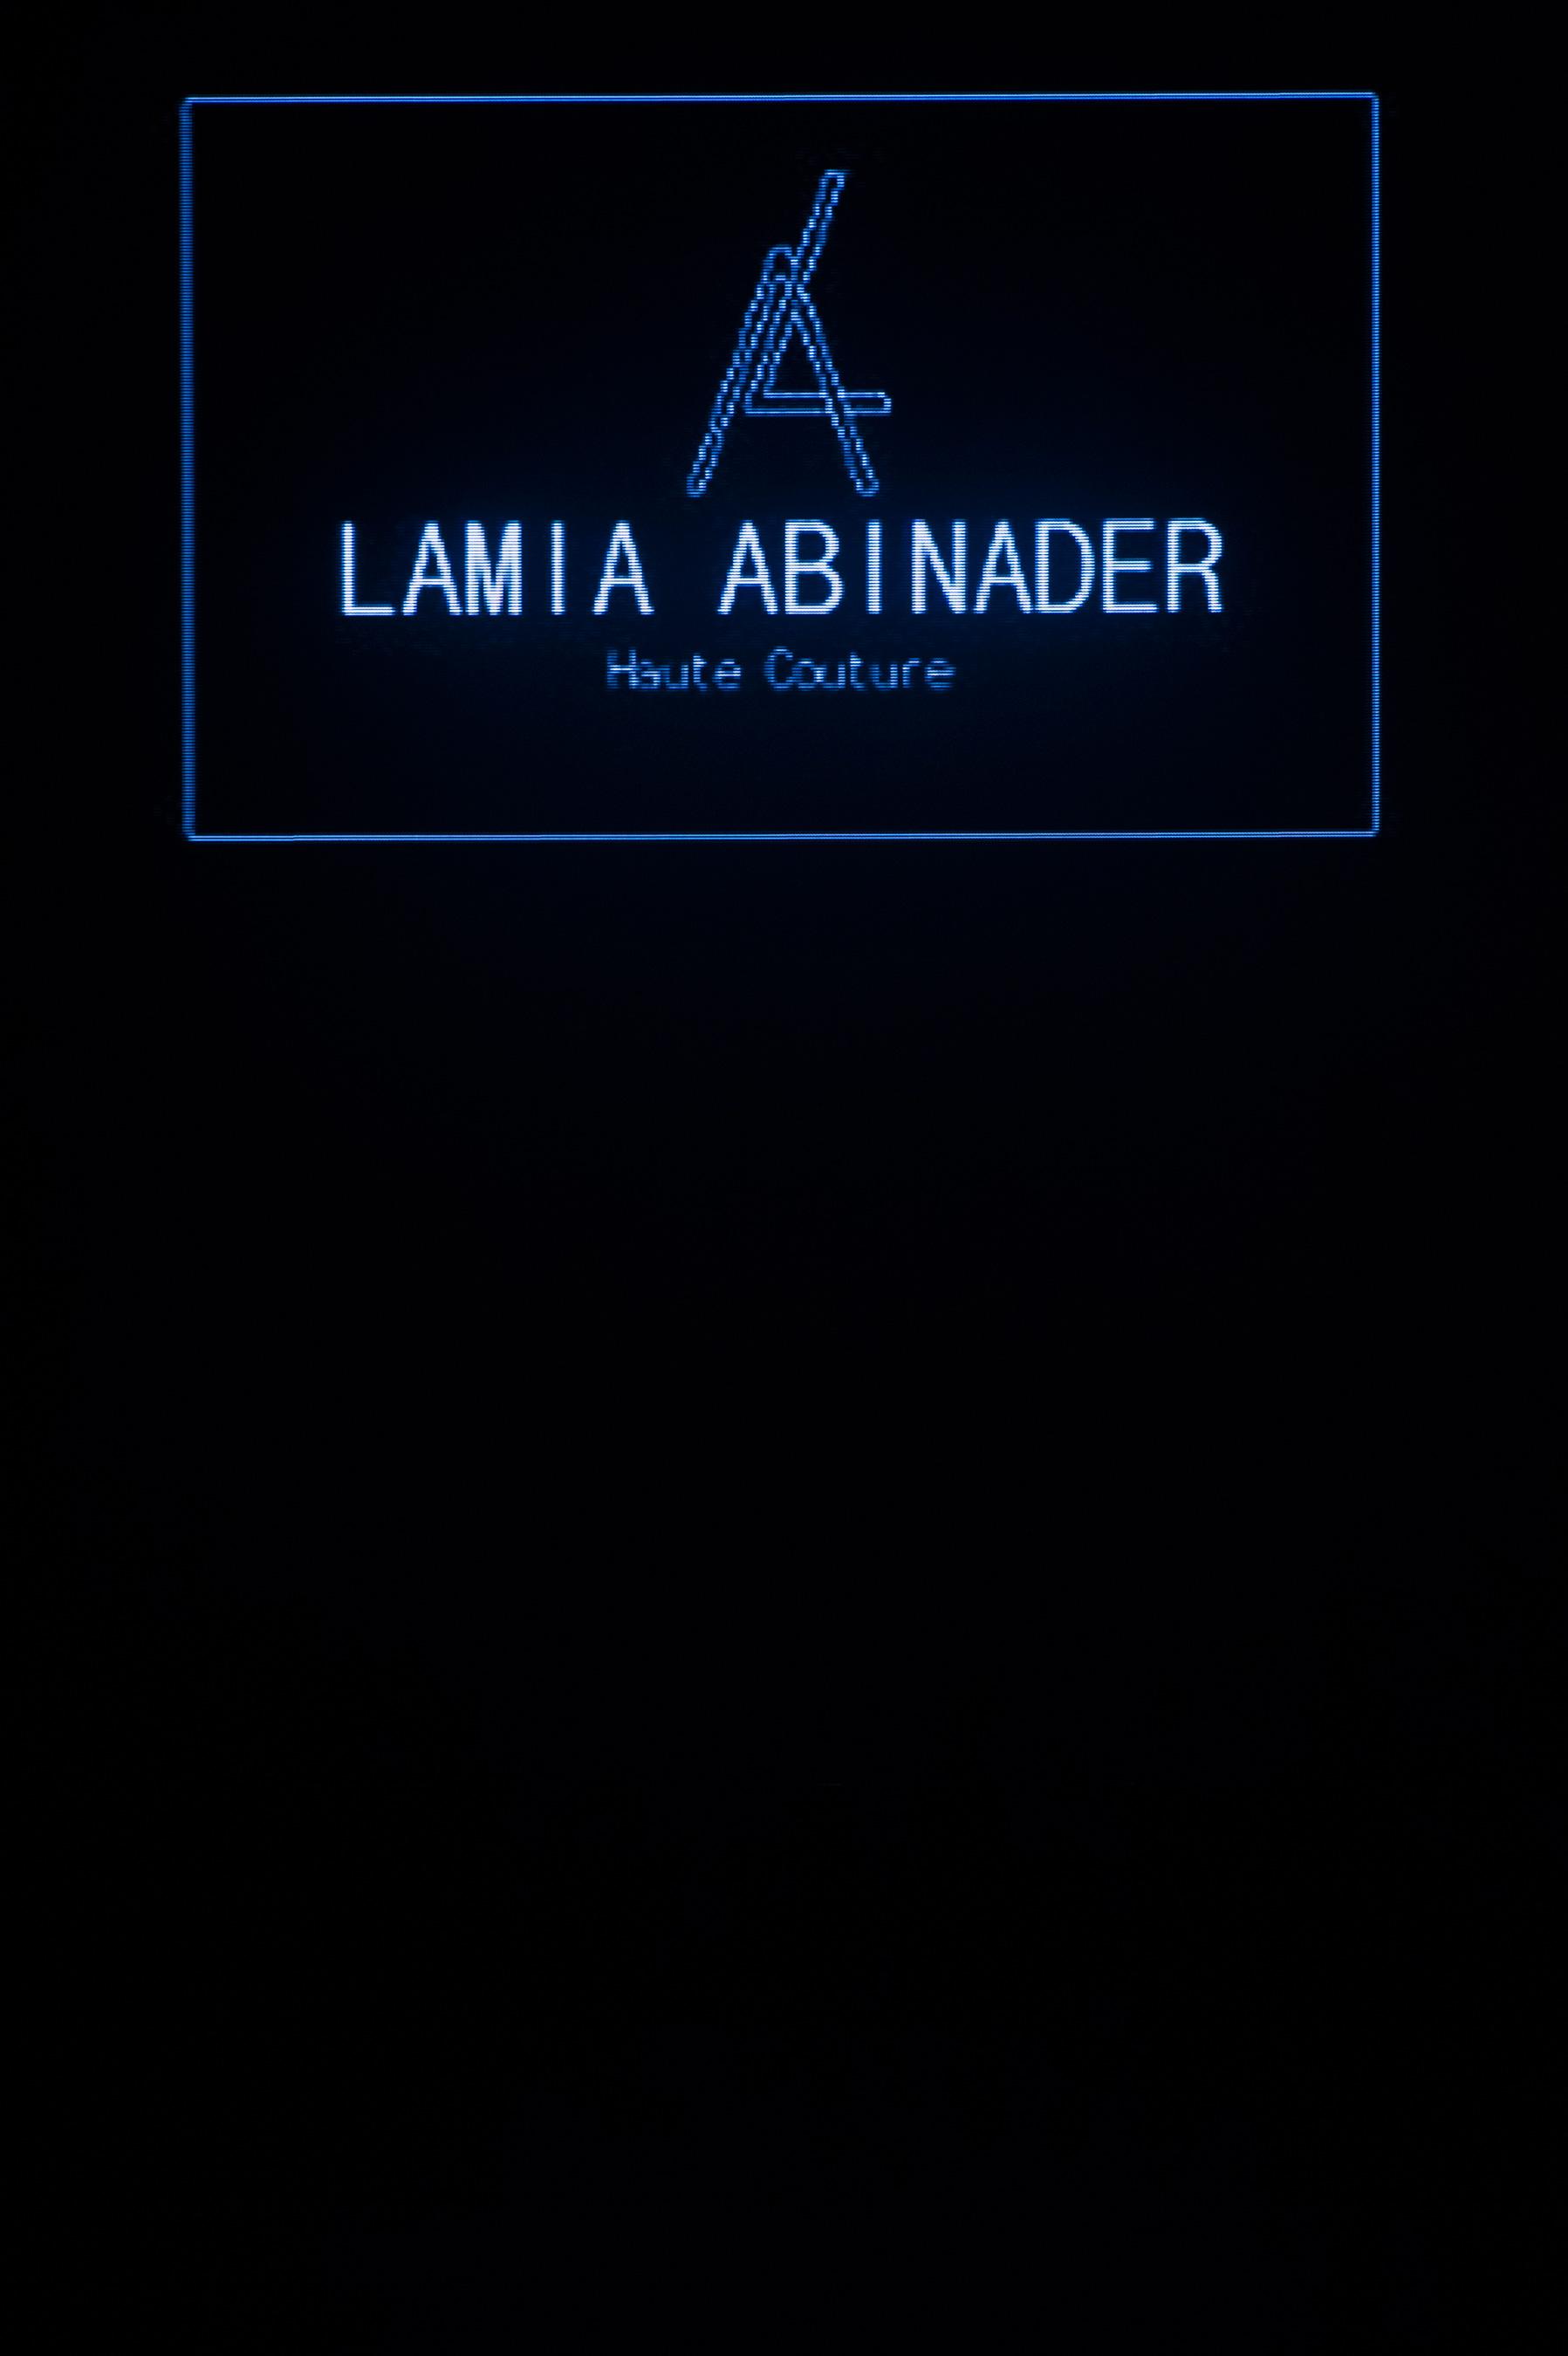 Lamia Abinader brd RS17 0001